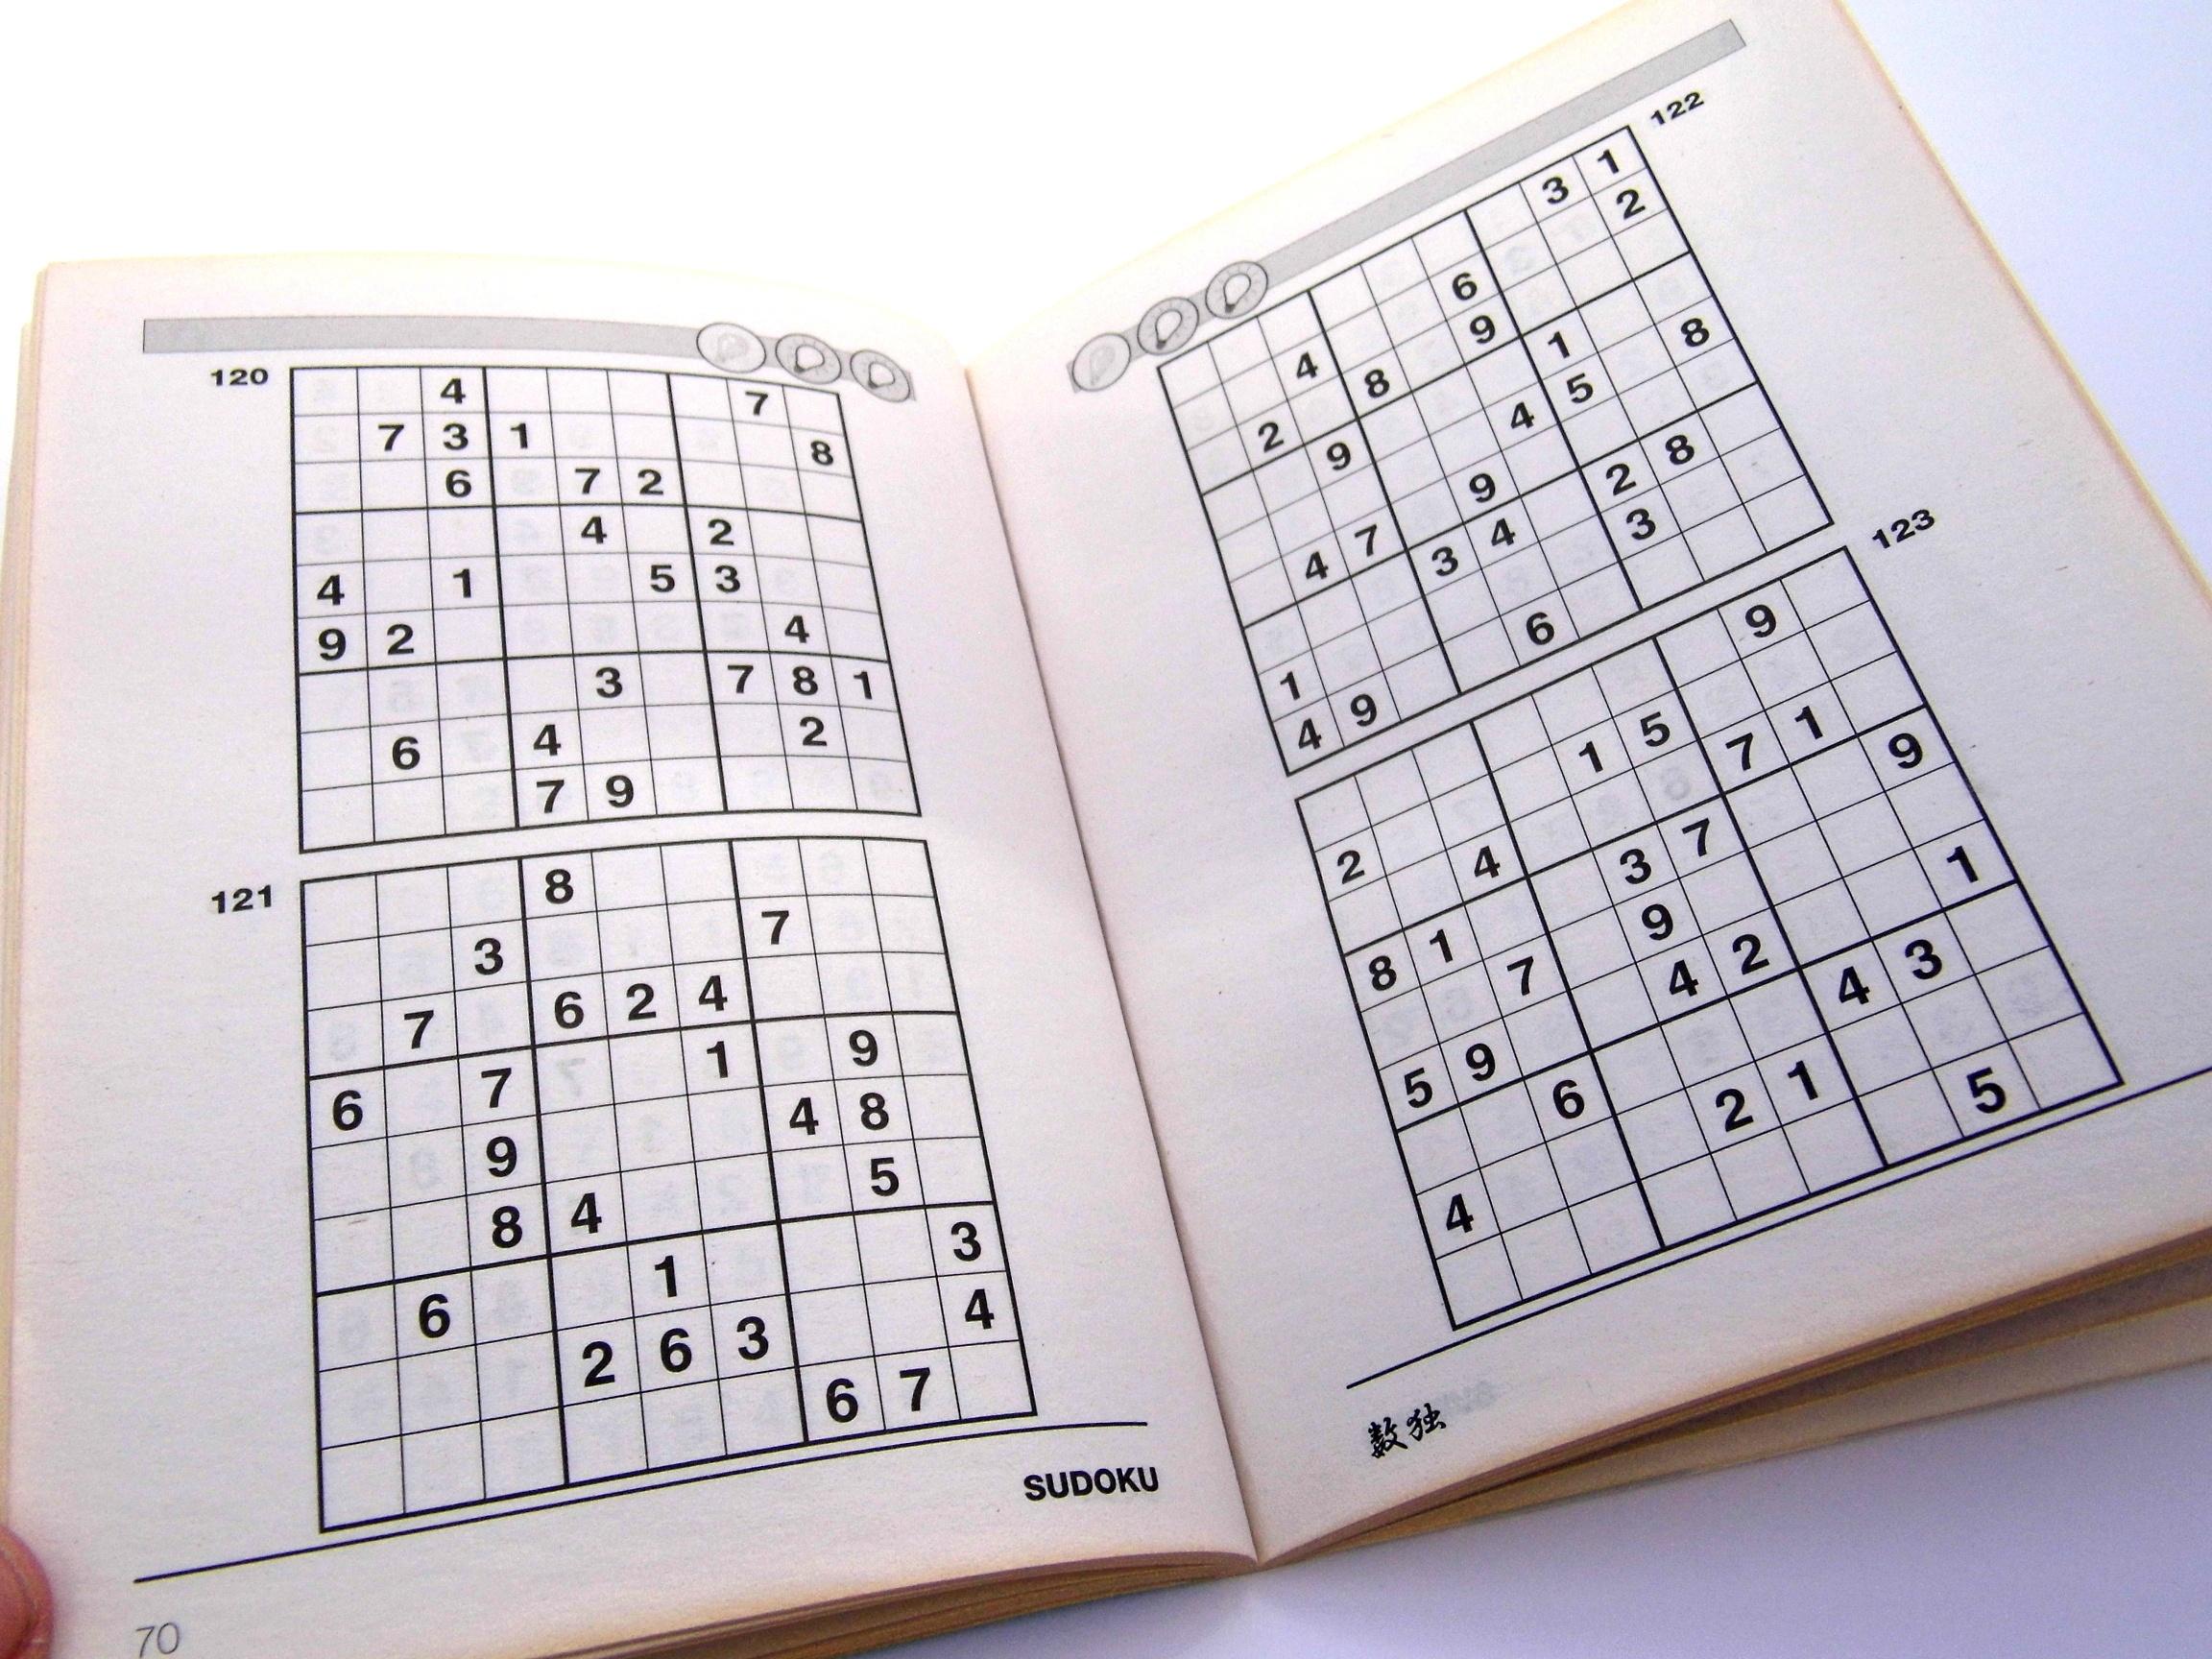 Free Sudoku Puzzles – Free Sudoku Puzzles From Easy To Evil Level - Www Free Printable Sudoku Puzzles Com